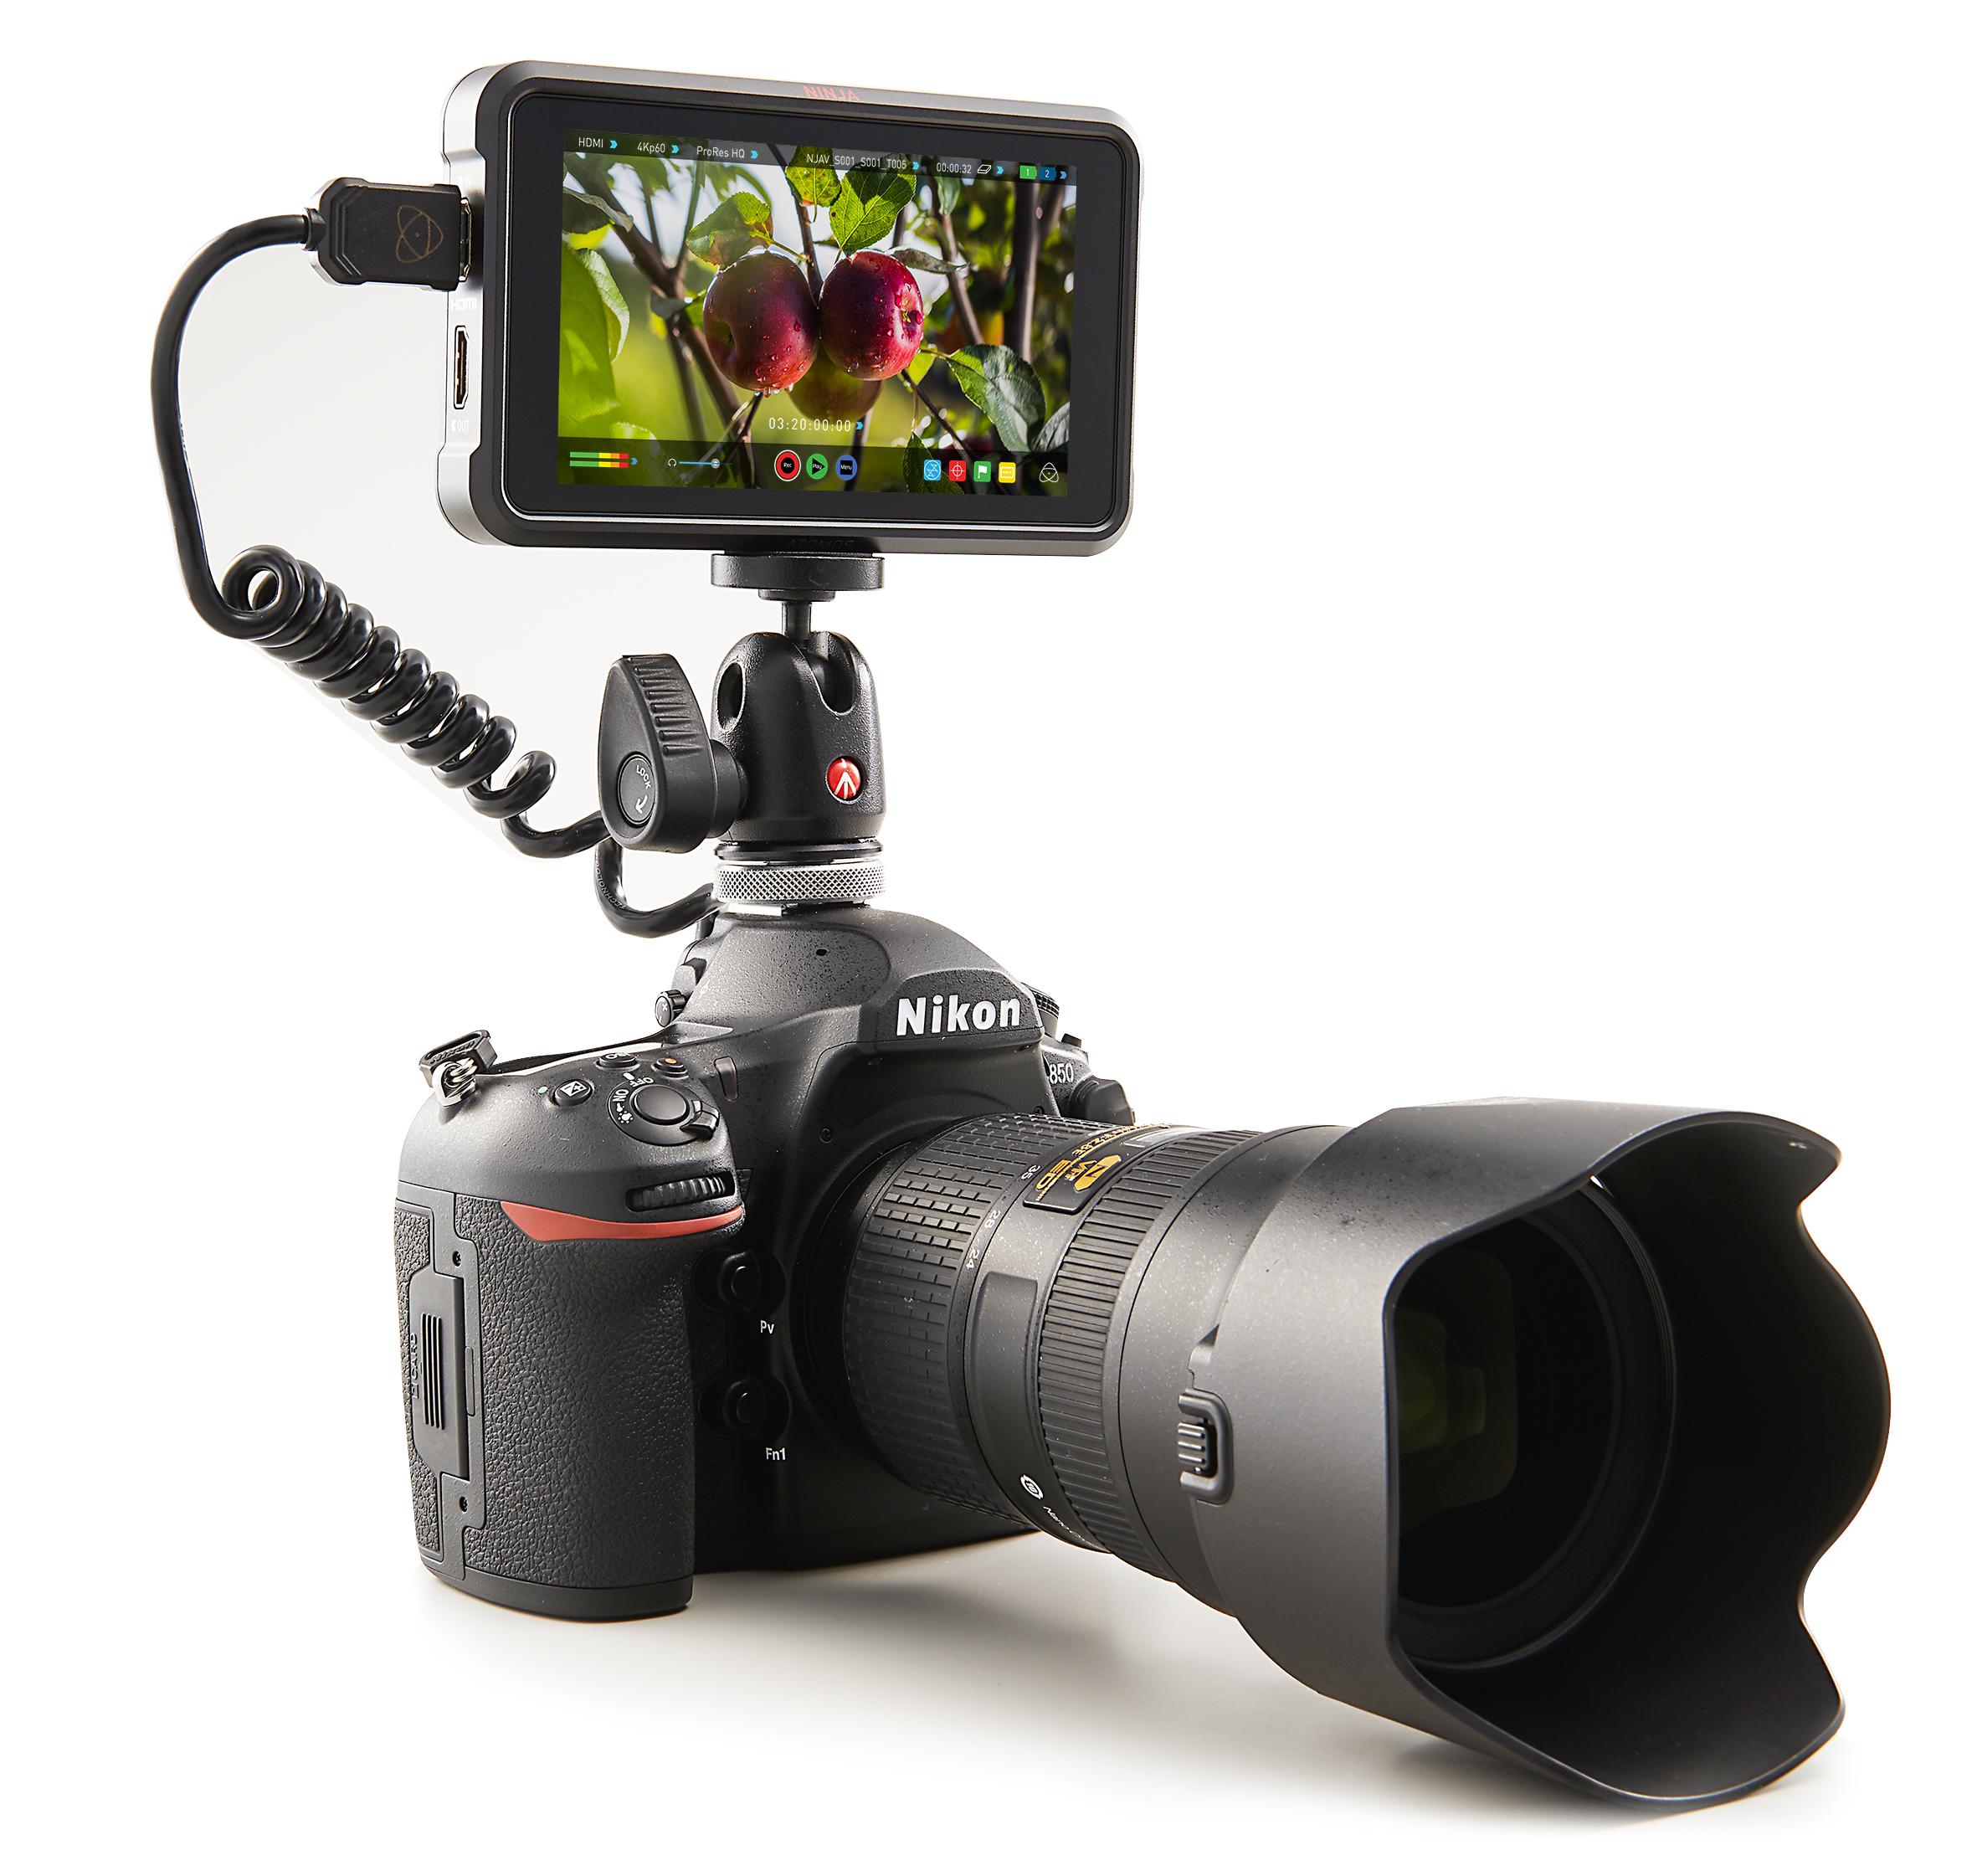 Atomos Ninja V 4Kp60 10bit HDR Daylight Viewable 1000nit Portable Monitor/Recorder - additional image 1